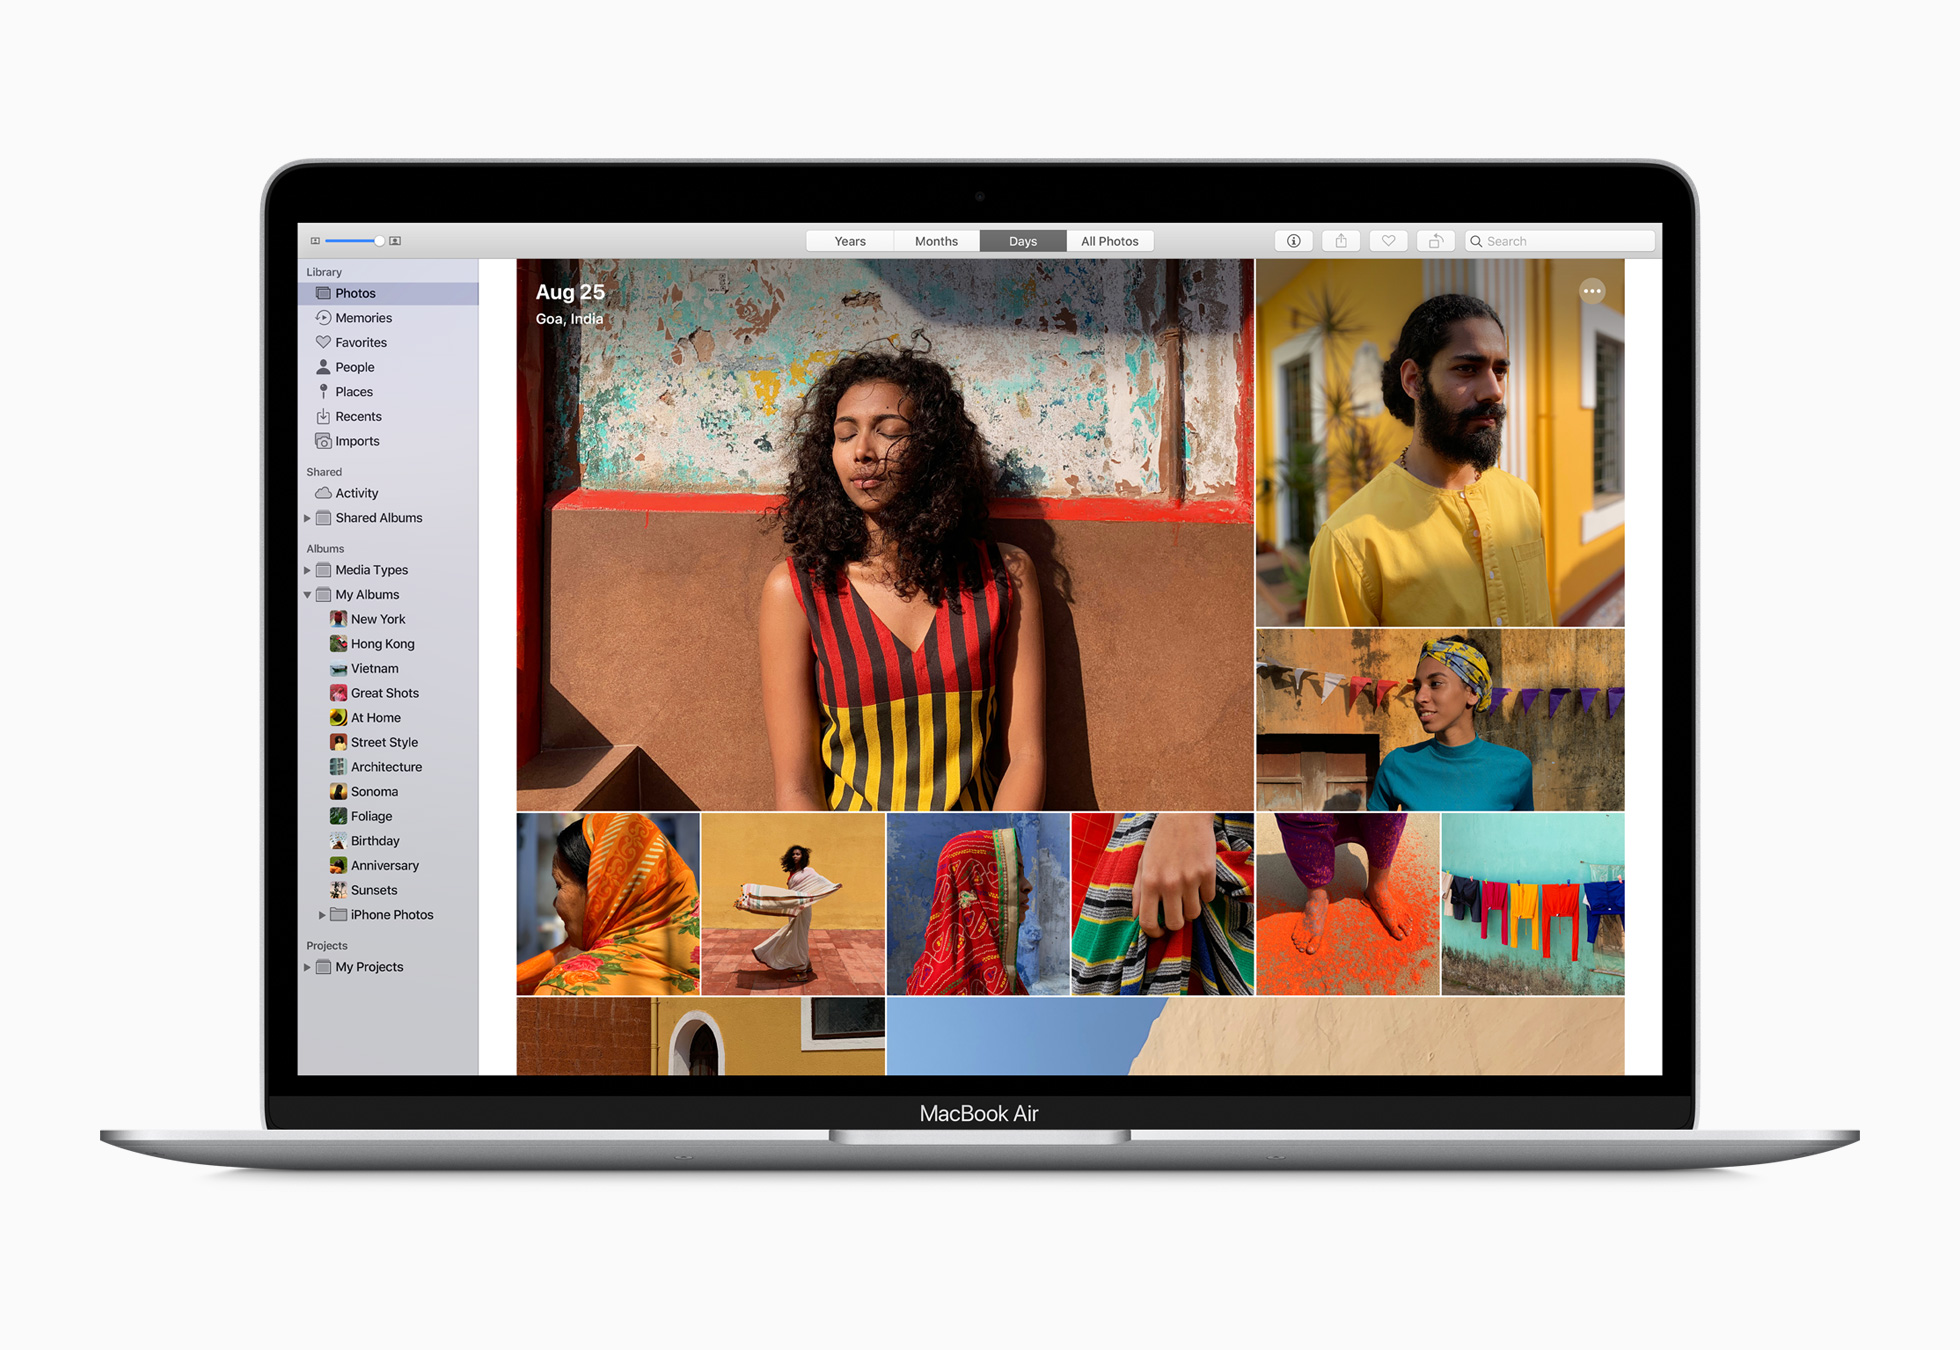 Apple_new-macbook-air-storage-photo-screen_03182020_big.jpg.large_2x.jpg (1960×1350)